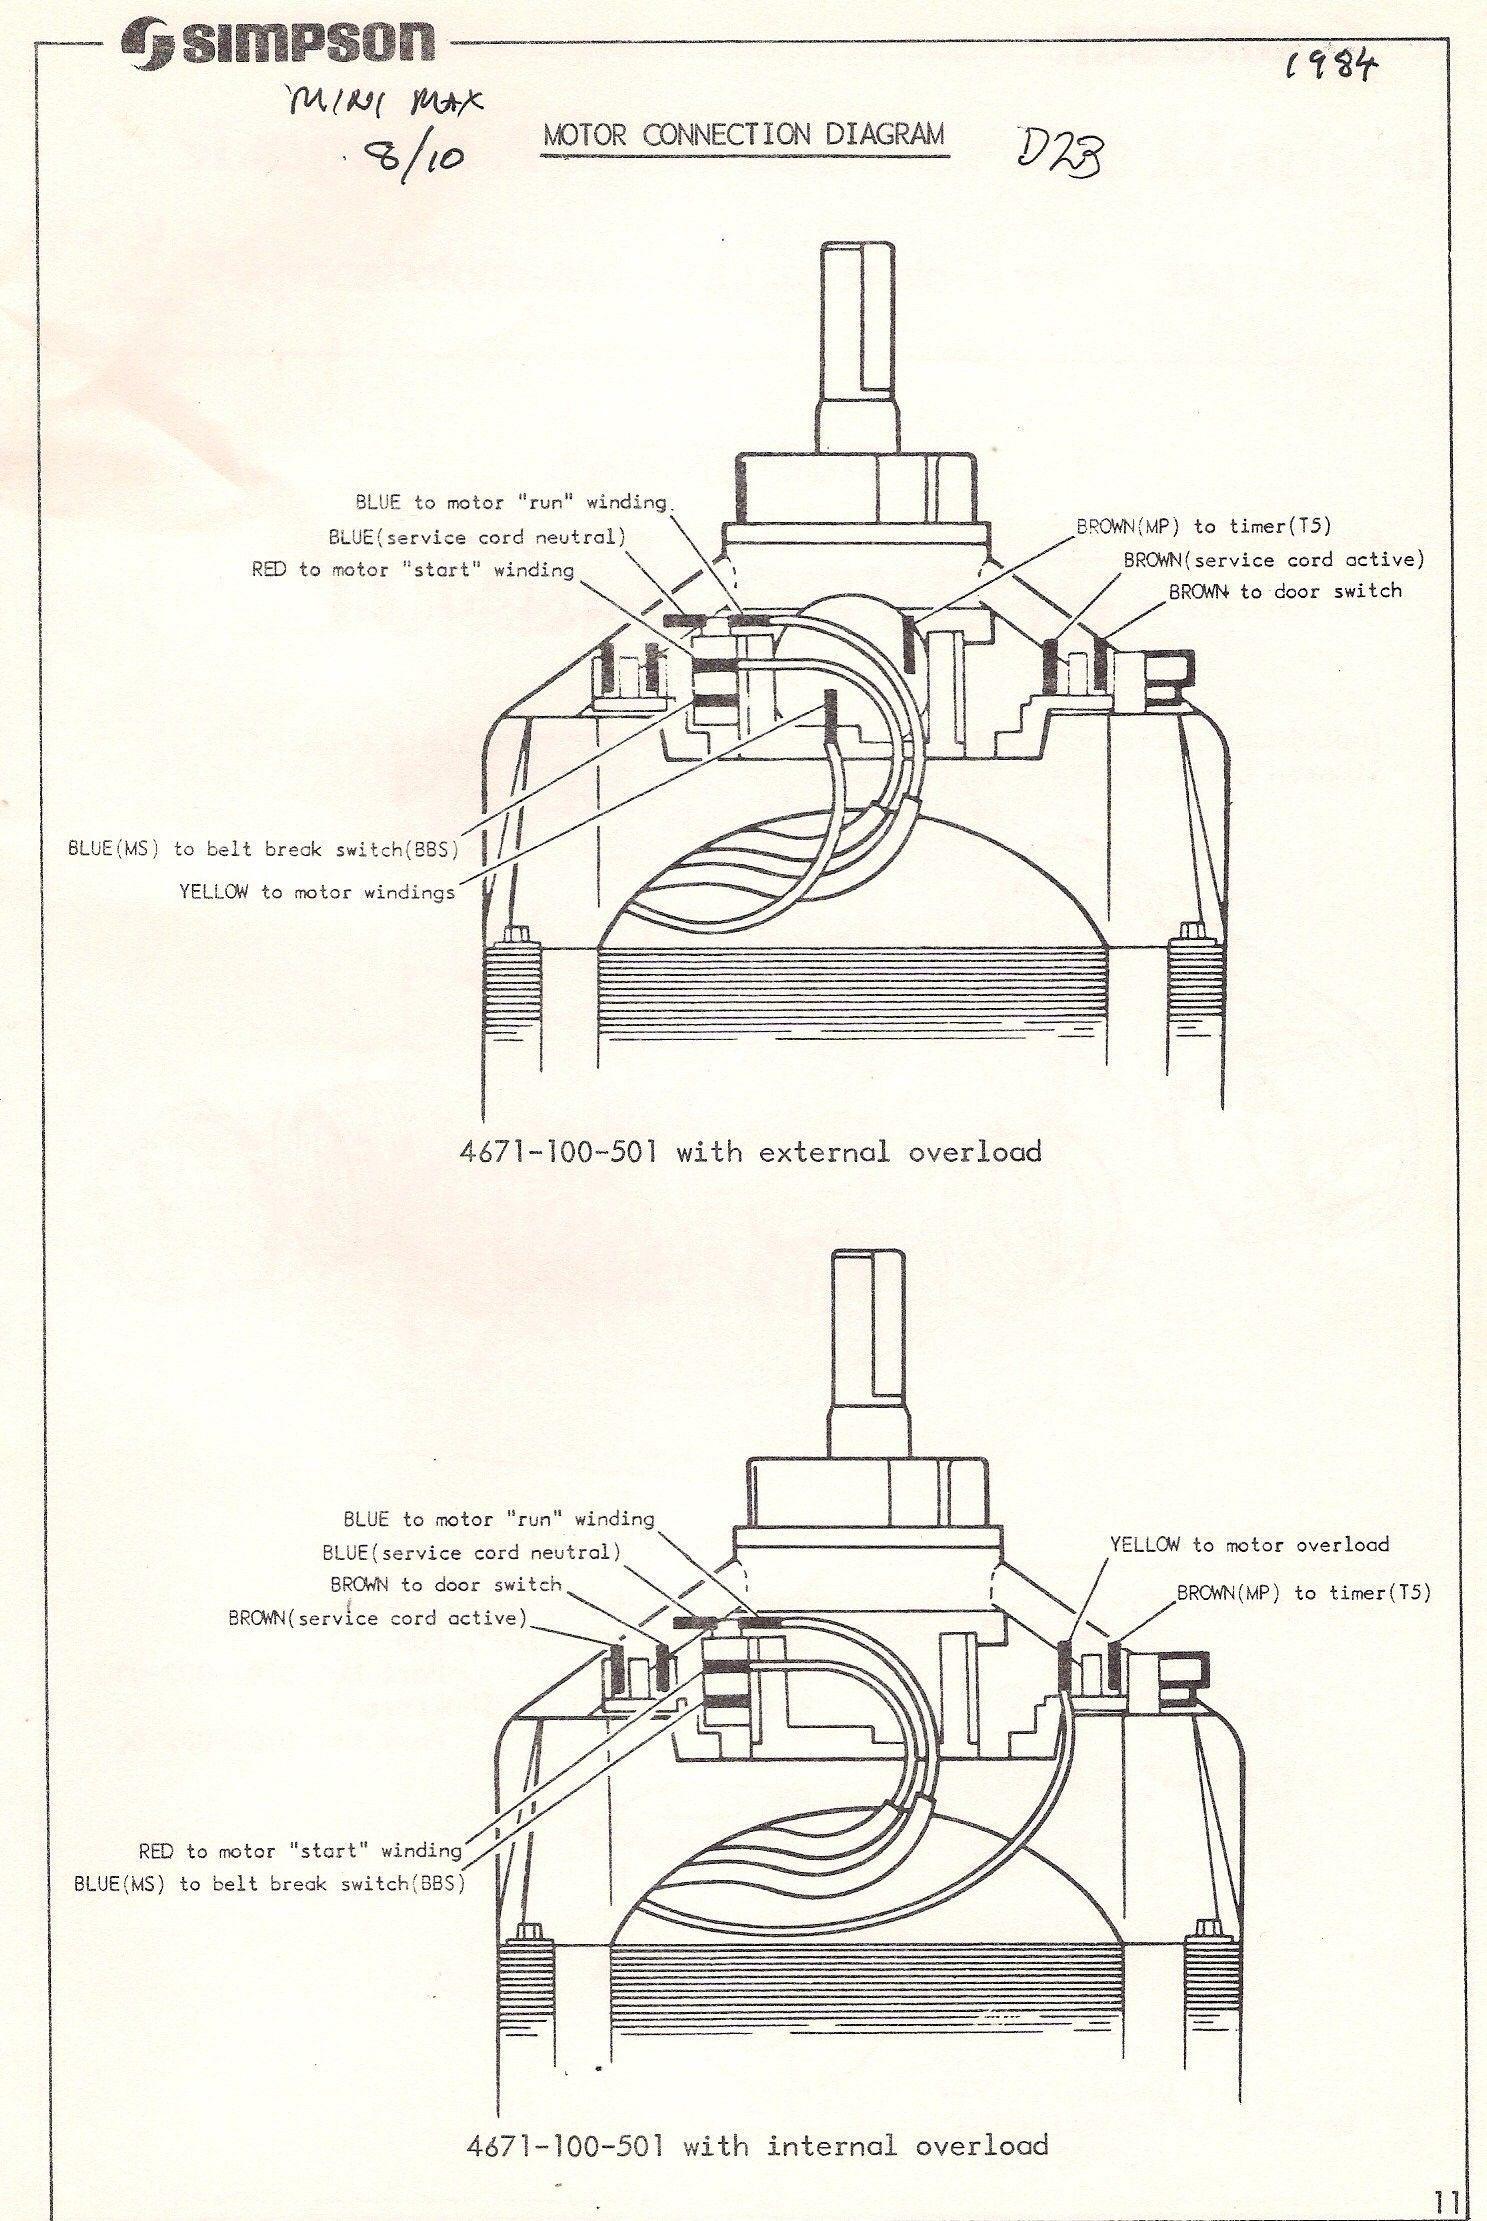 Ge Motor Wiring Diagram : motor, wiring, diagram, Wiring, Diagram, Electric, Motor, #diagram, #diagramsample, #diagramtemplate, #wiringdiagram, #diagramchart, #worksheet, #worksh…, Chart,, Kenmore,